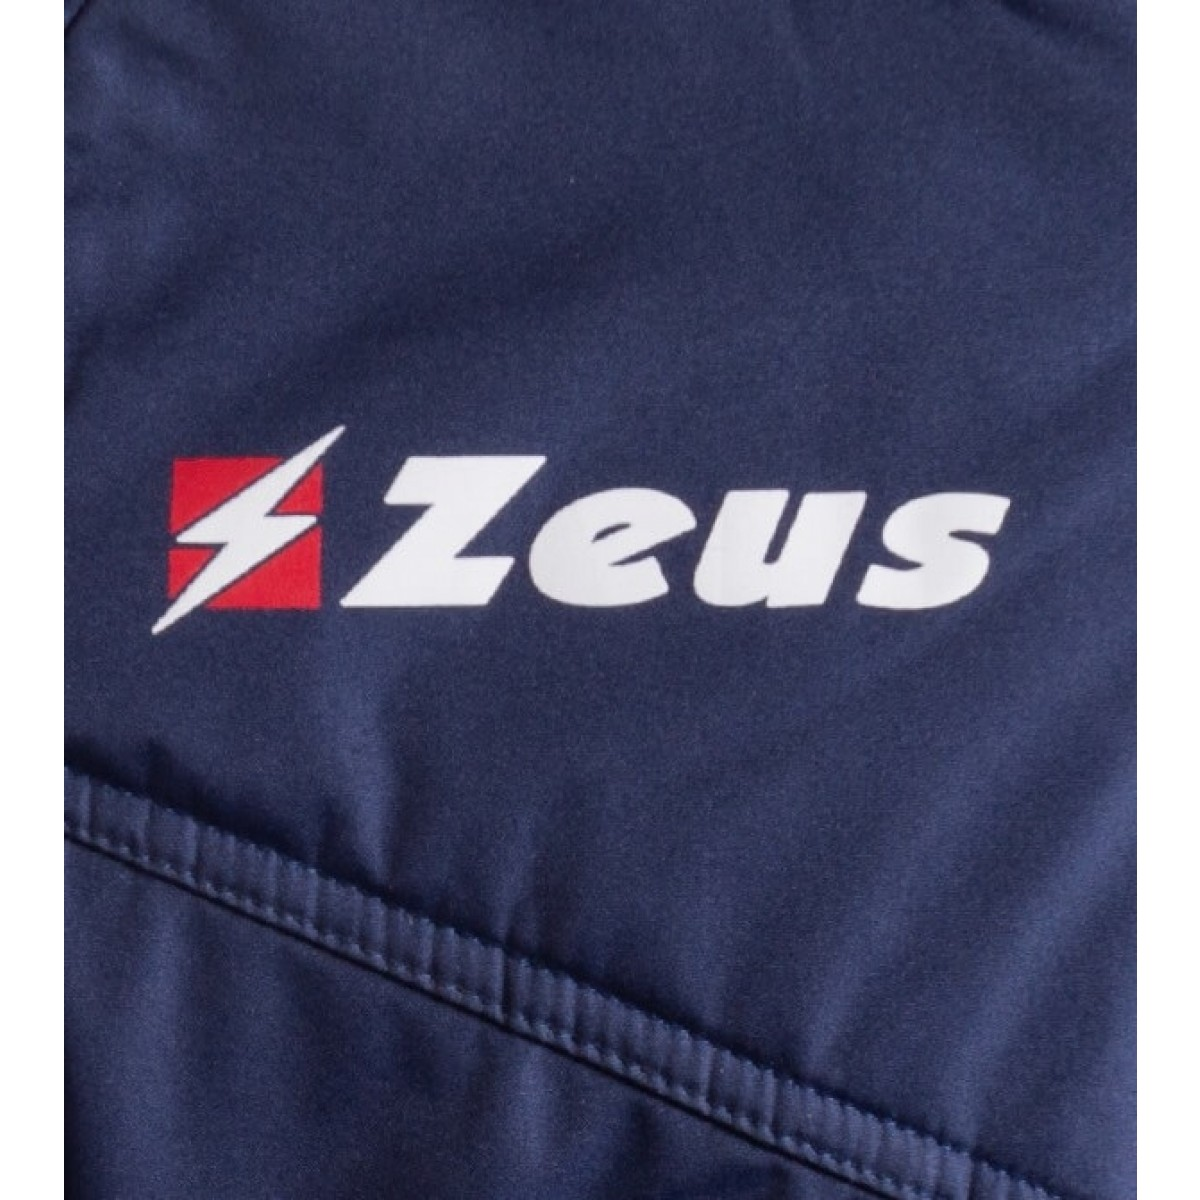 Zeus Ulysse vinterjakke mørkeblå rød